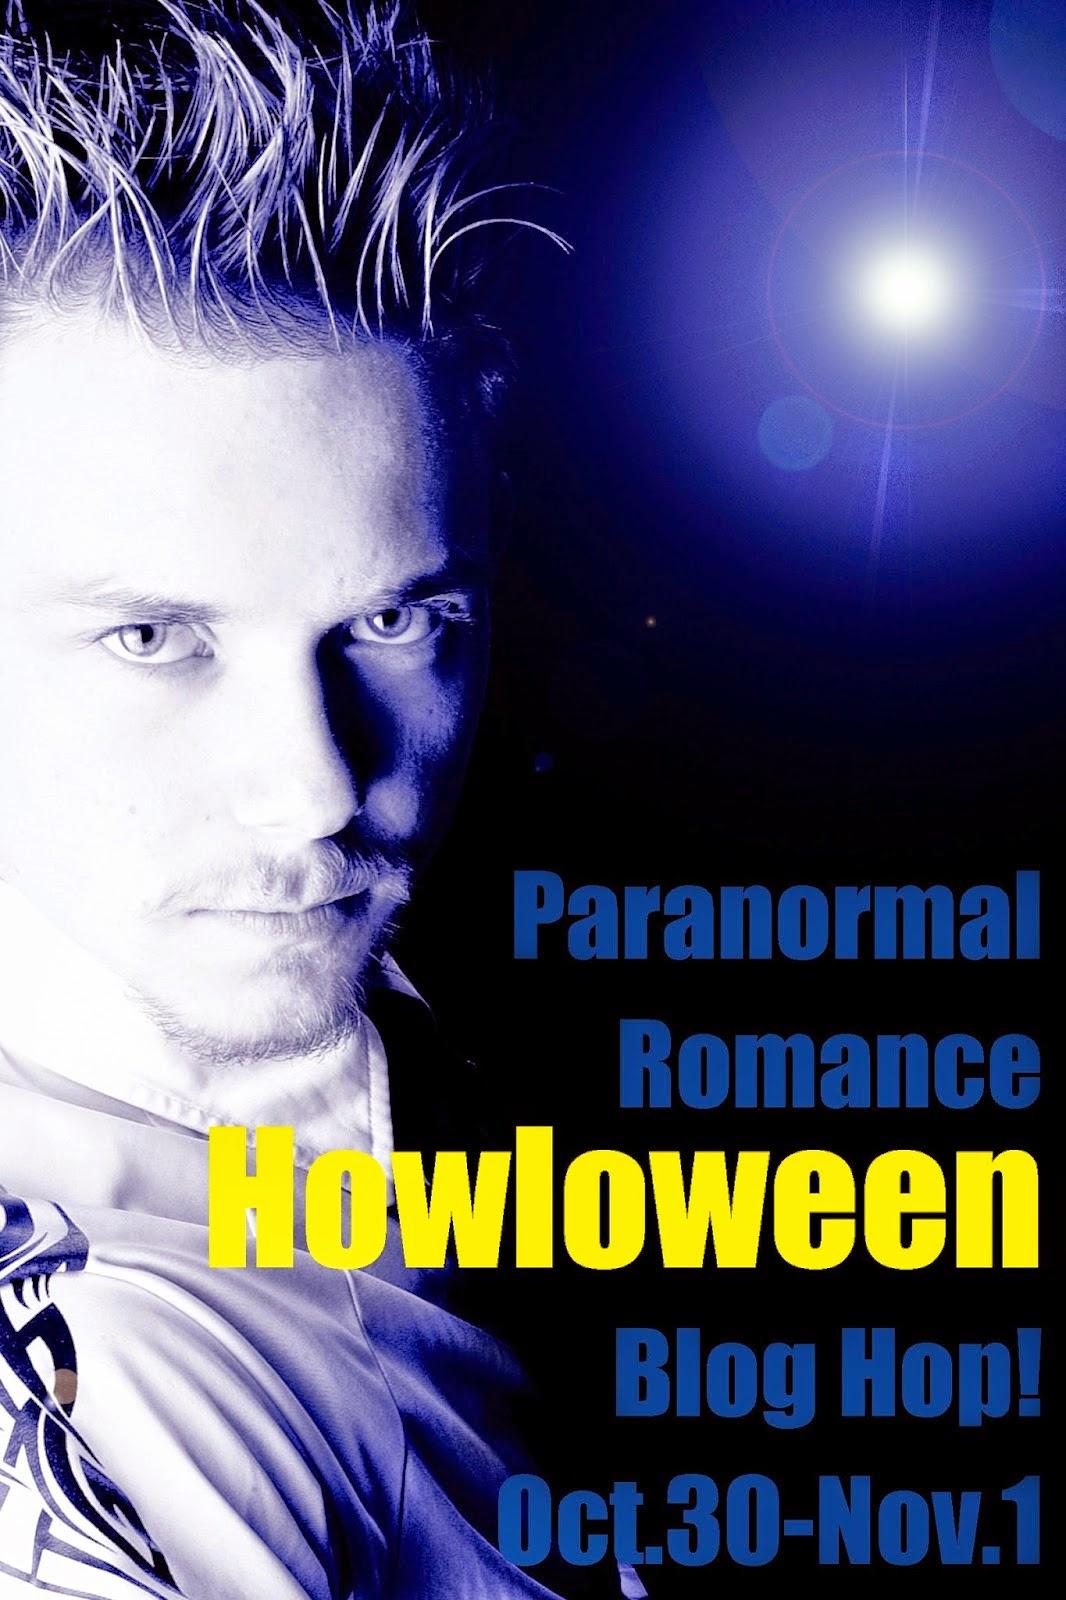 Paranormal Romance Howloween Blog Hop